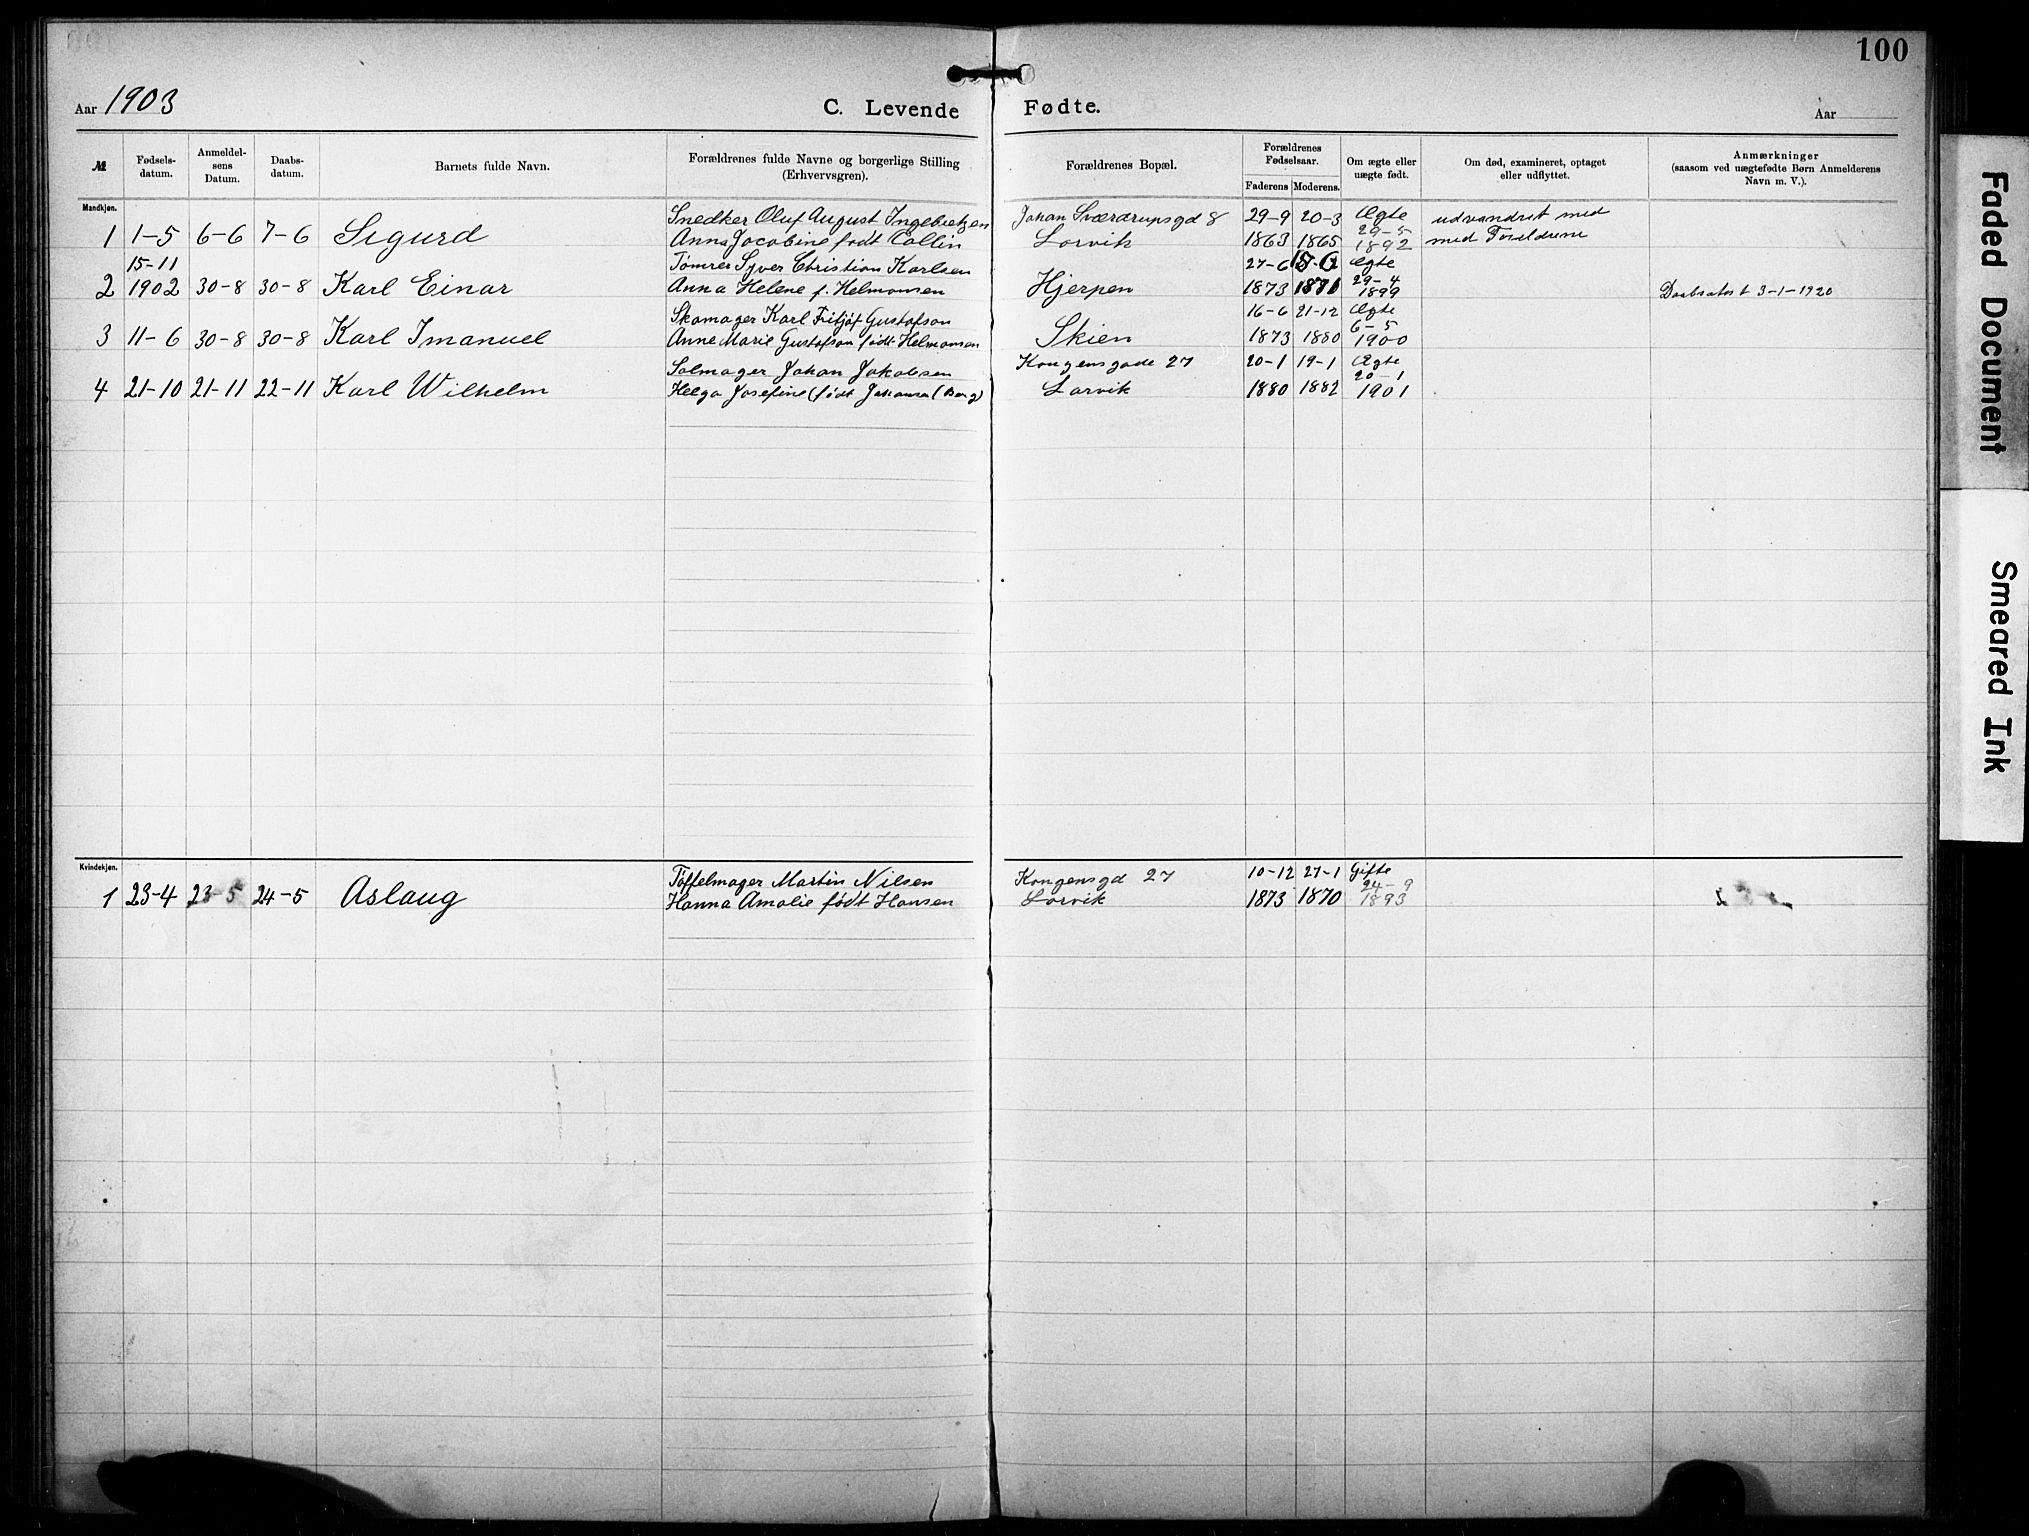 SAKO, Den katolsk-apostoliske menighet i Larvik, F/Fa/L0001: Dissenterprotokoll nr. 1, 1892-1933, s. 100